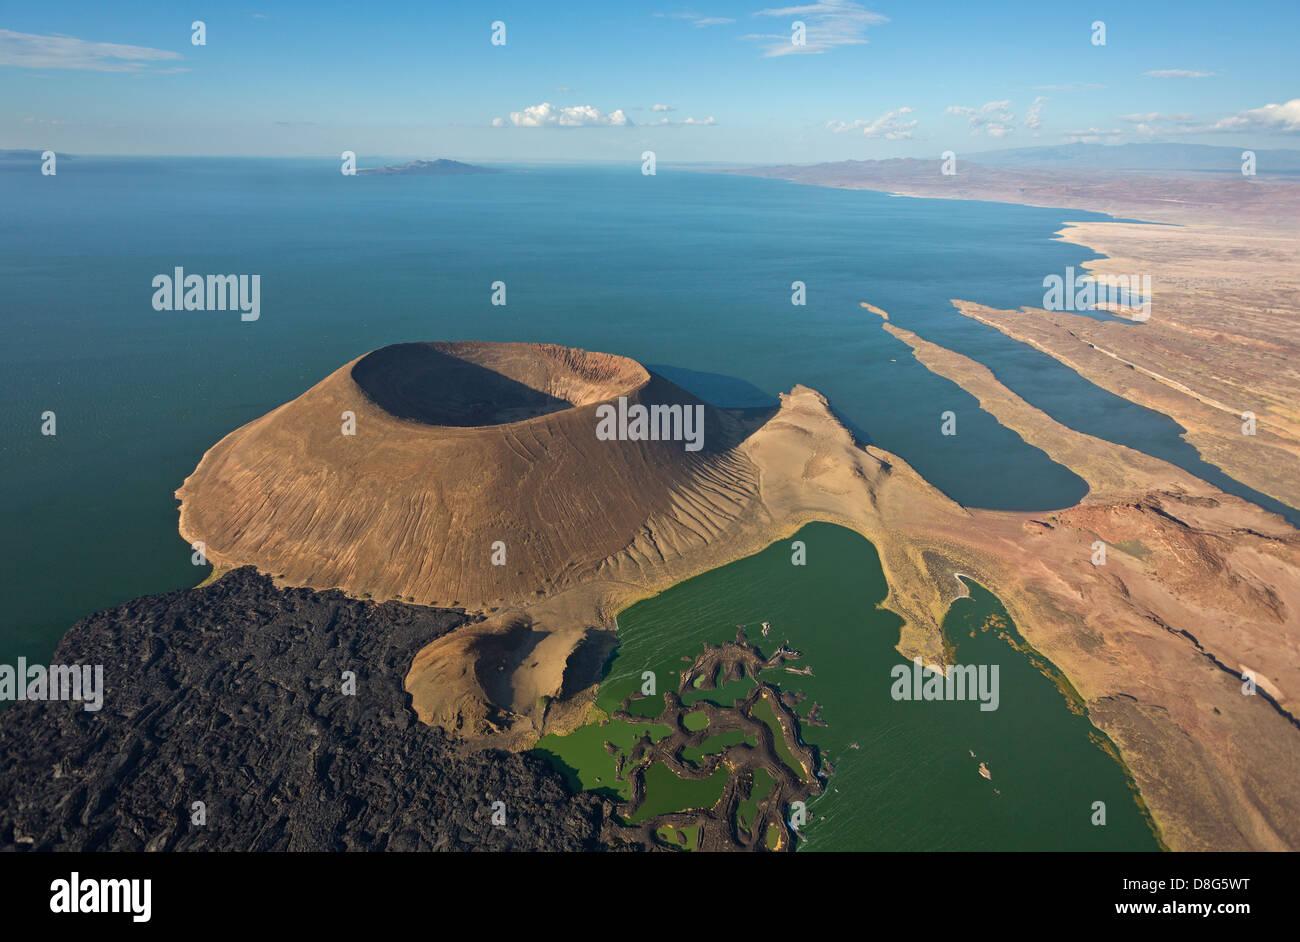 Aerial view of Nabuyatom Crater,south of Lake Turkana.Kenya - Stock Image